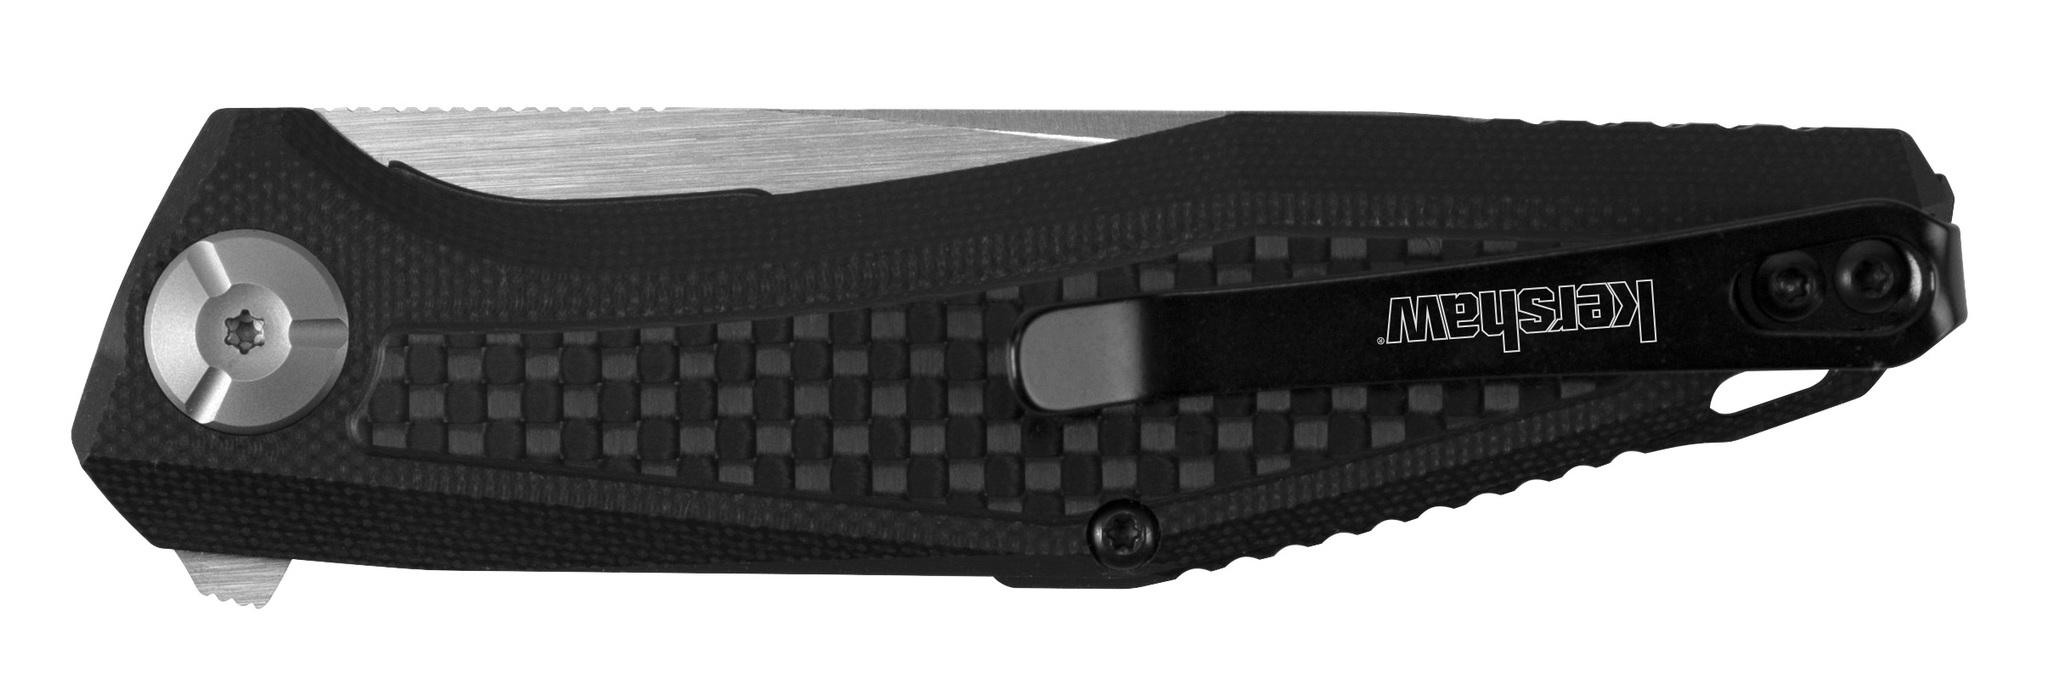 Фото 4 - Нож складной Atmos - Kershaw 4037, сталь 8Cr13MoV, рукоять G10/карбон